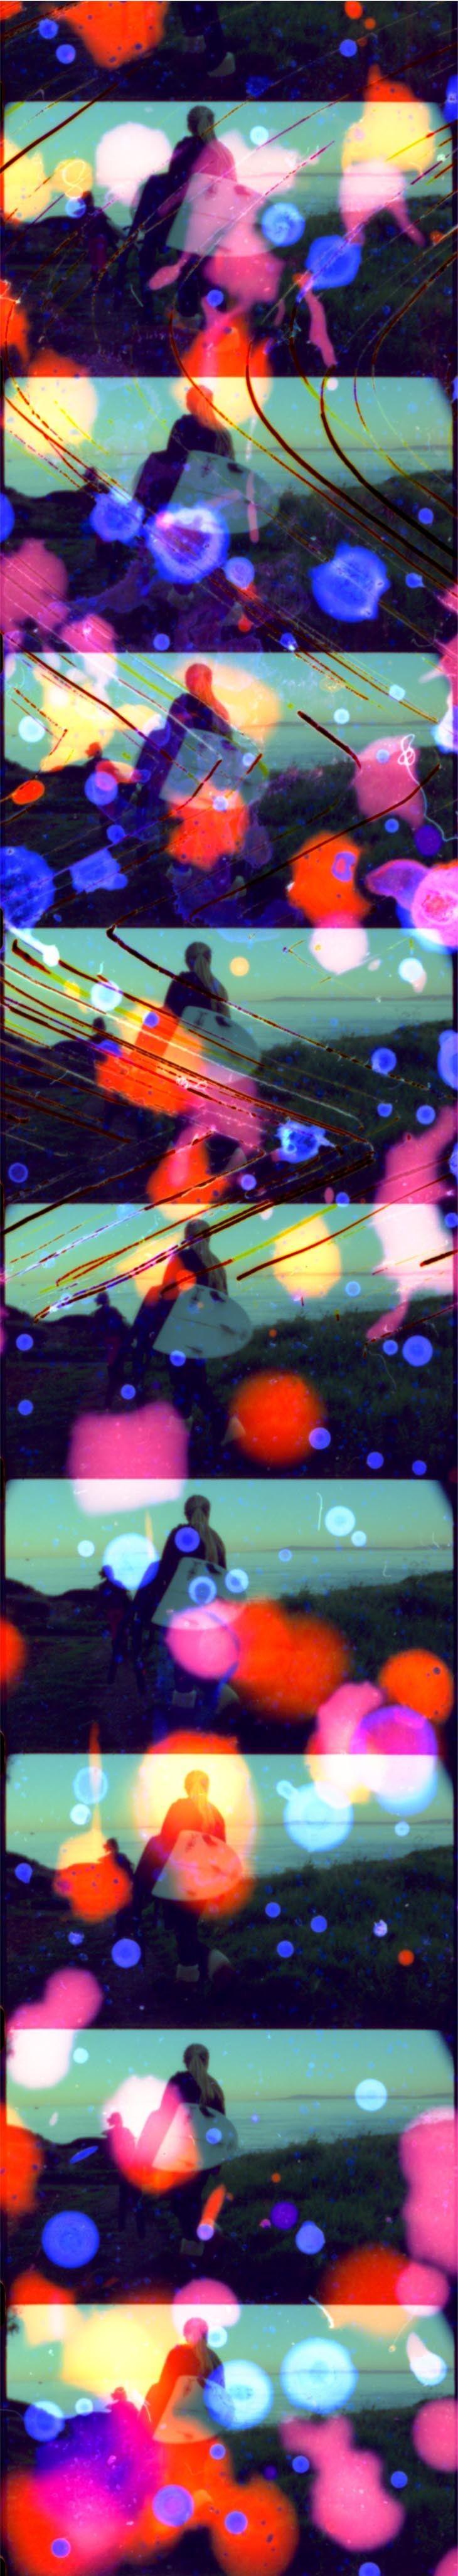 Jennifer West Jennifer West Artist39s Profile The Saatchi Gallery